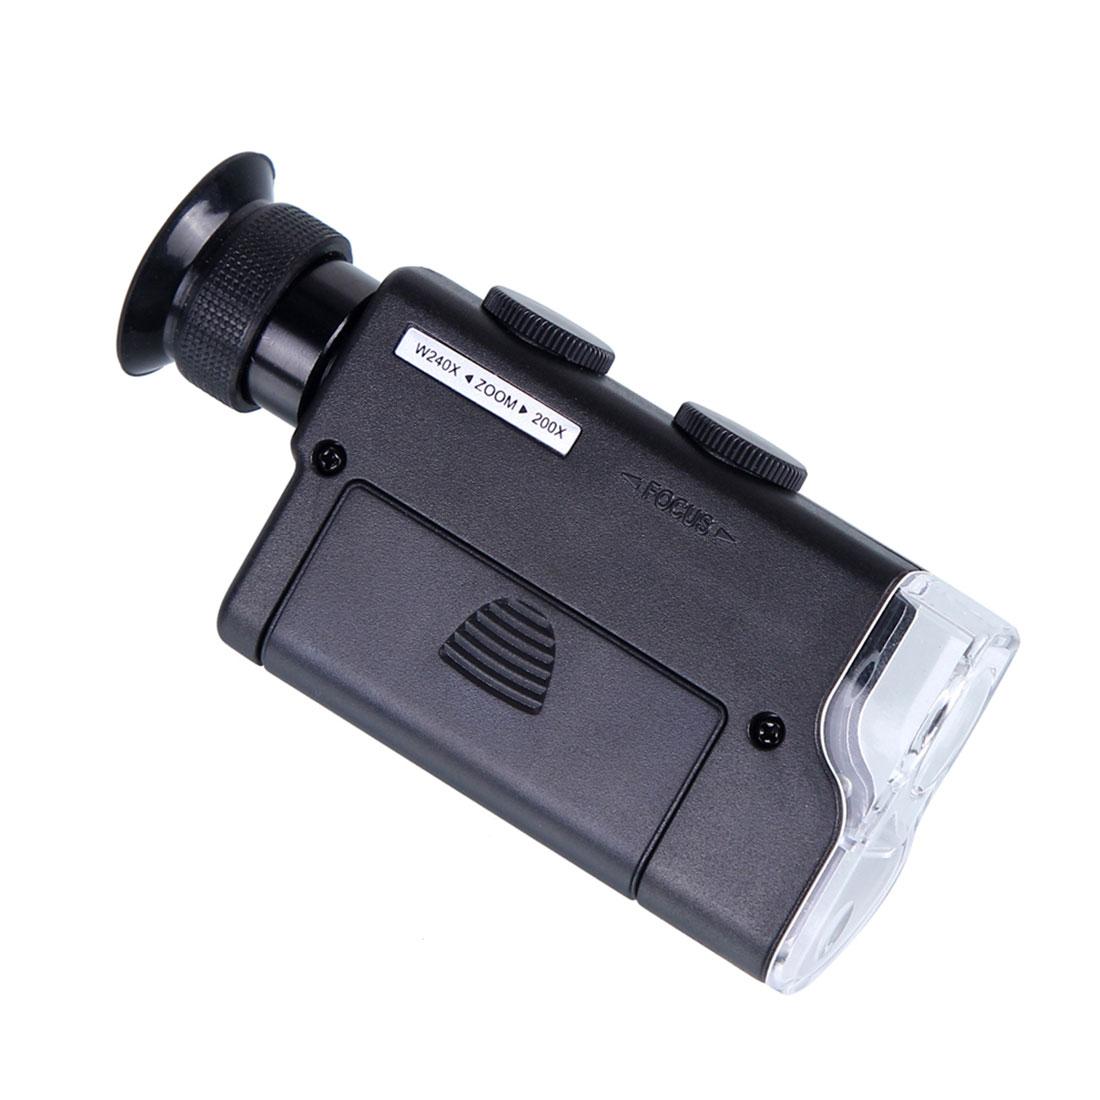 Hot! Mini Portátil de Bolso Microscópio 200X ~ 240X Portátil CONDUZIU a Luz Da Lâmpada Lupa Zoom Lente Lupa Lupa Lupa de Bolso